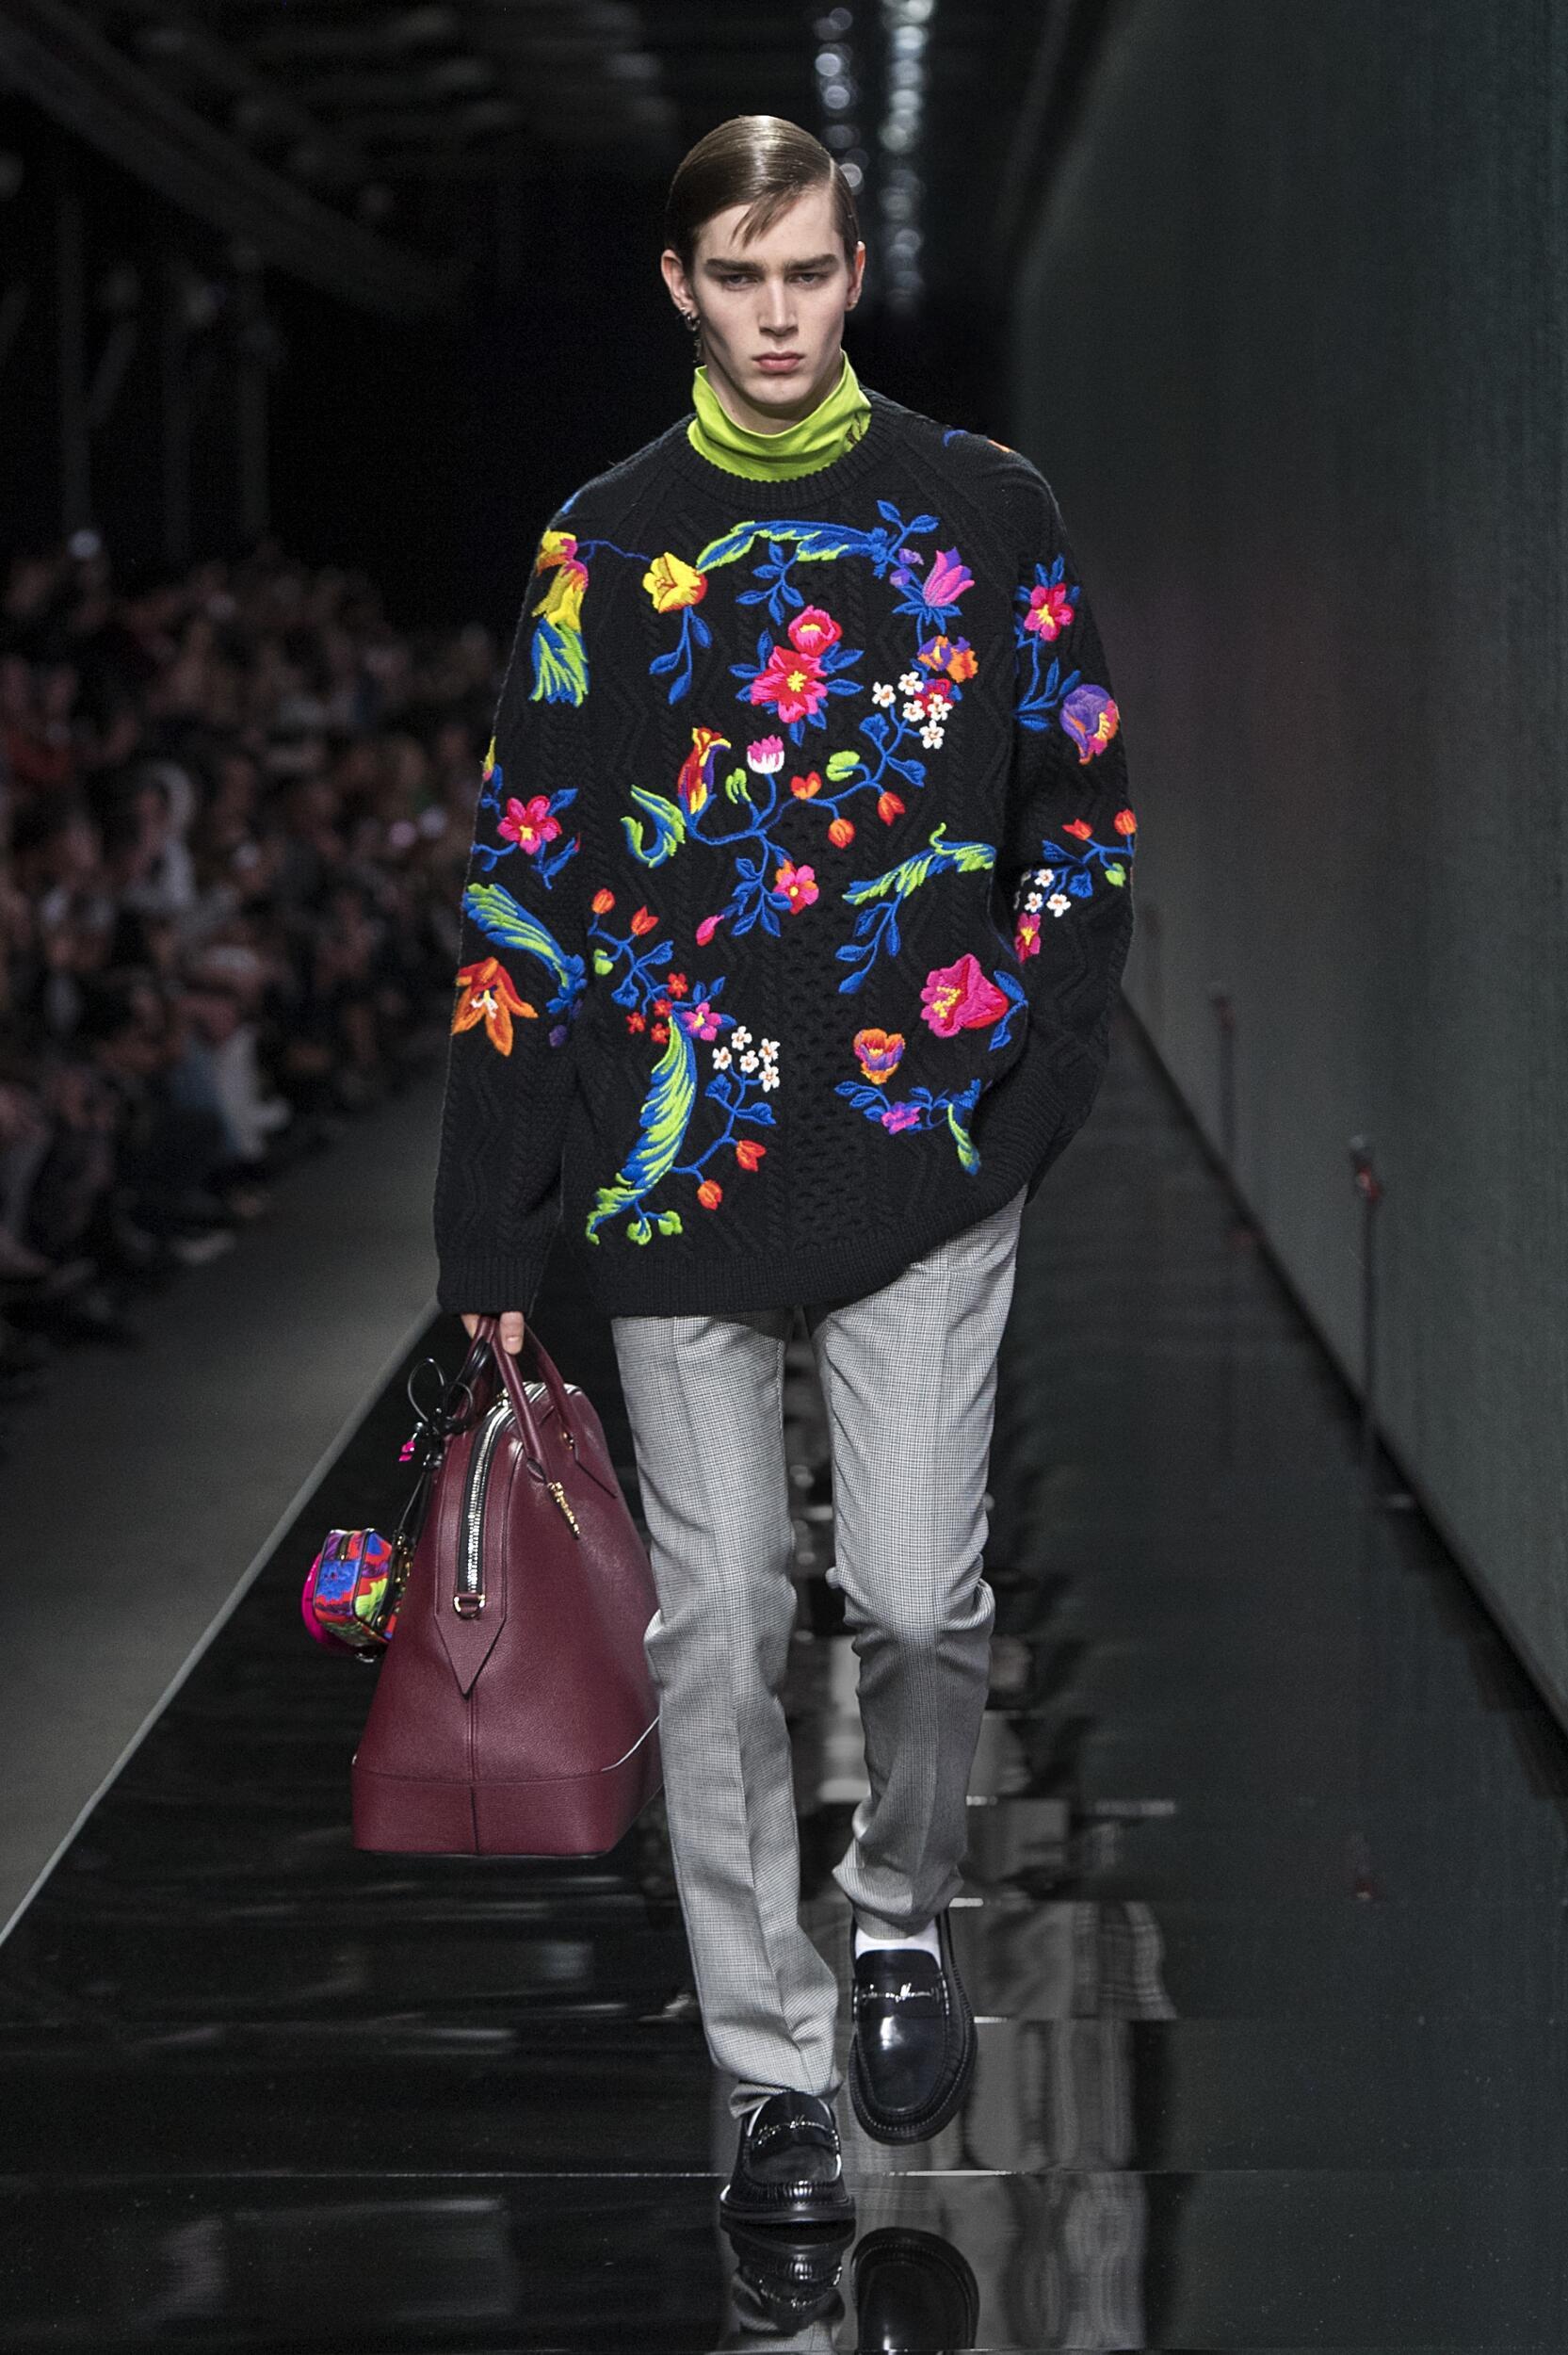 2020 Versace Winter Catwalk